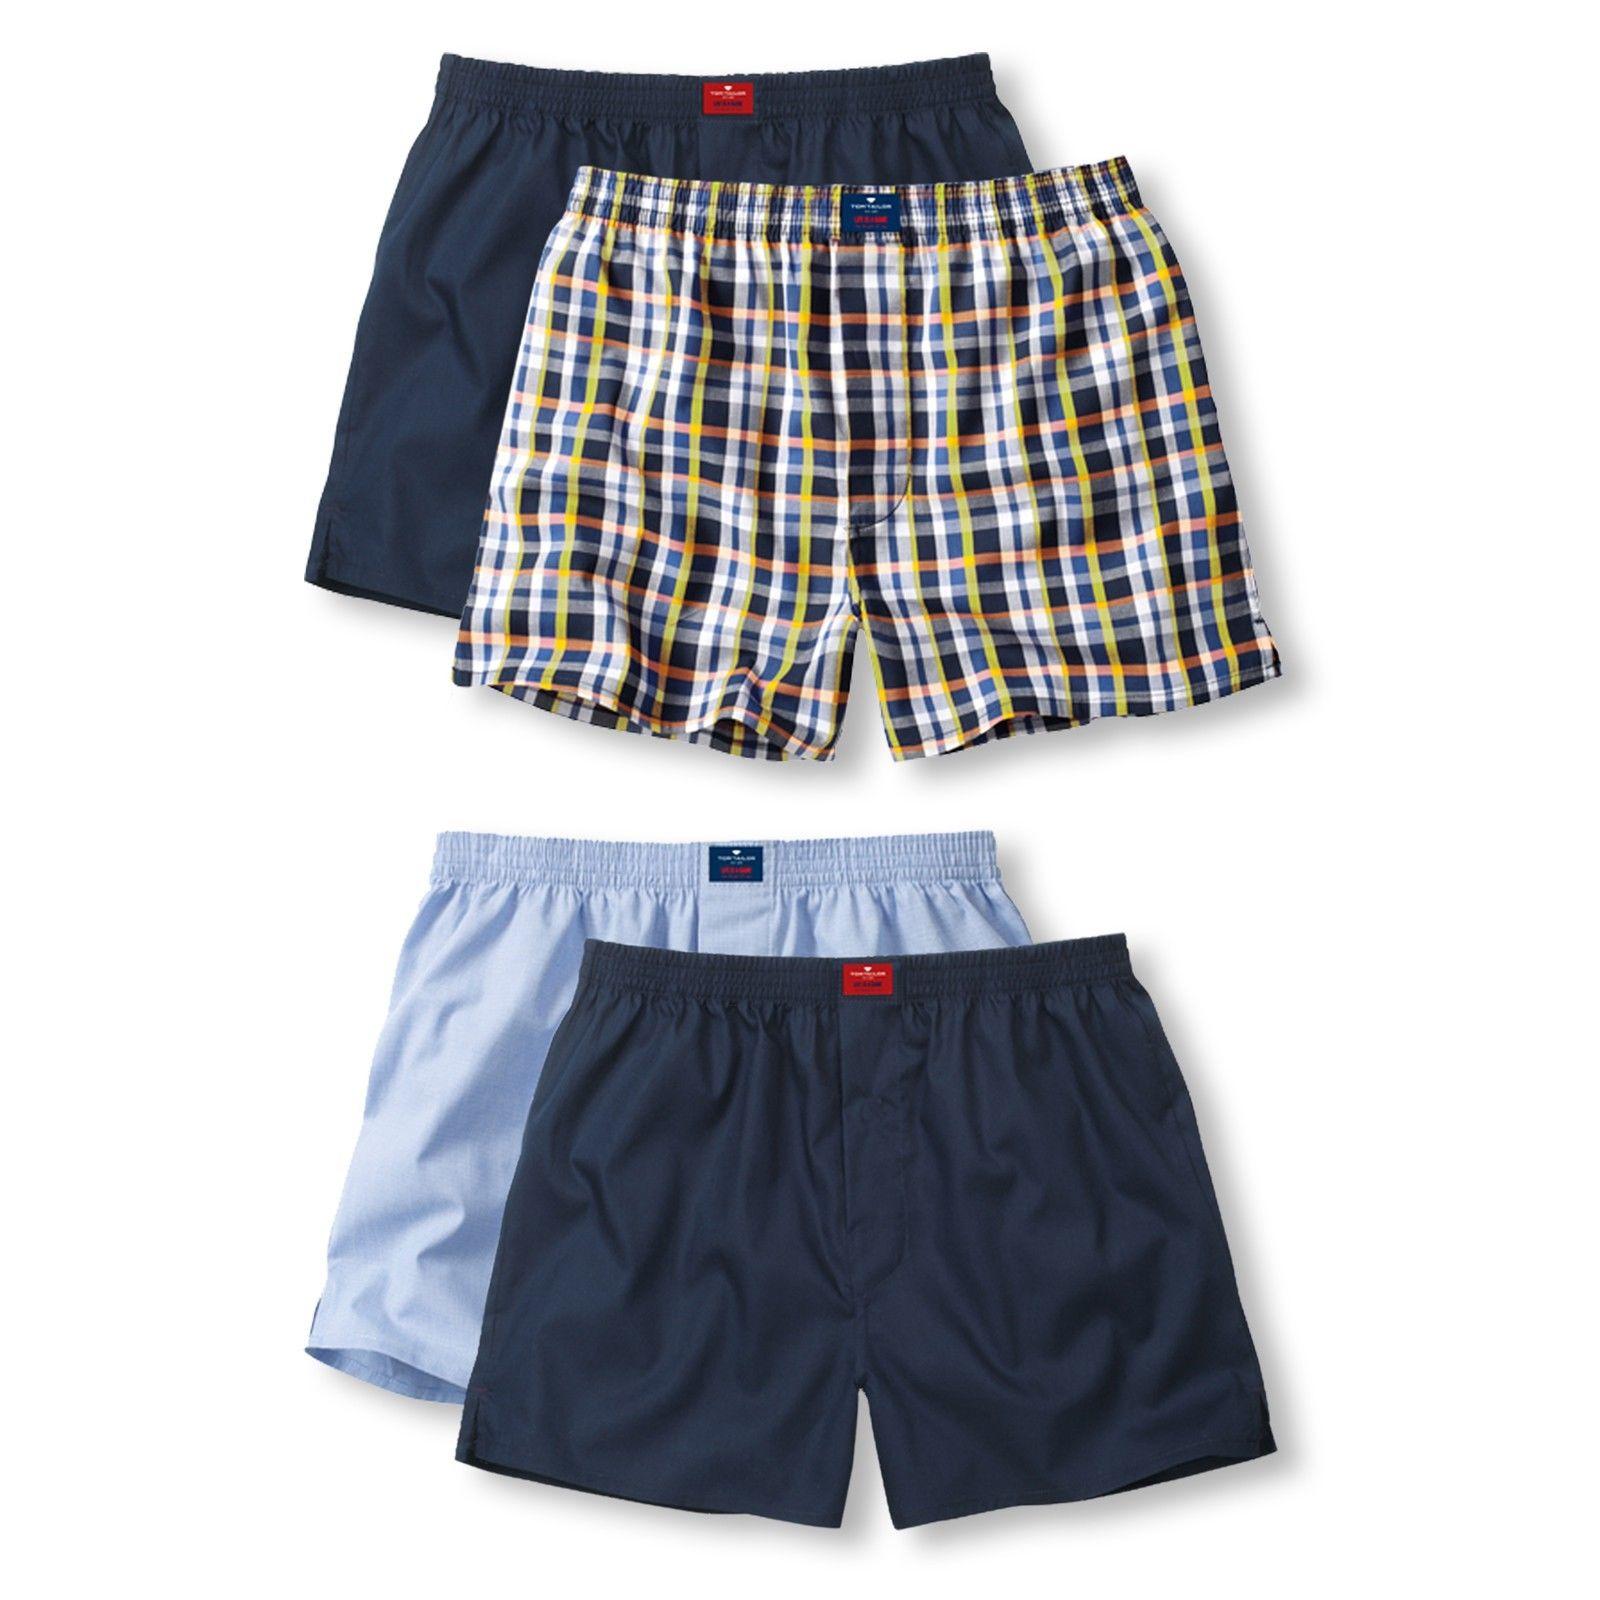 2er Pack Tom Tailor Webboxer Boxerhorts Shorts Unterhosen Westside M L XL XXL